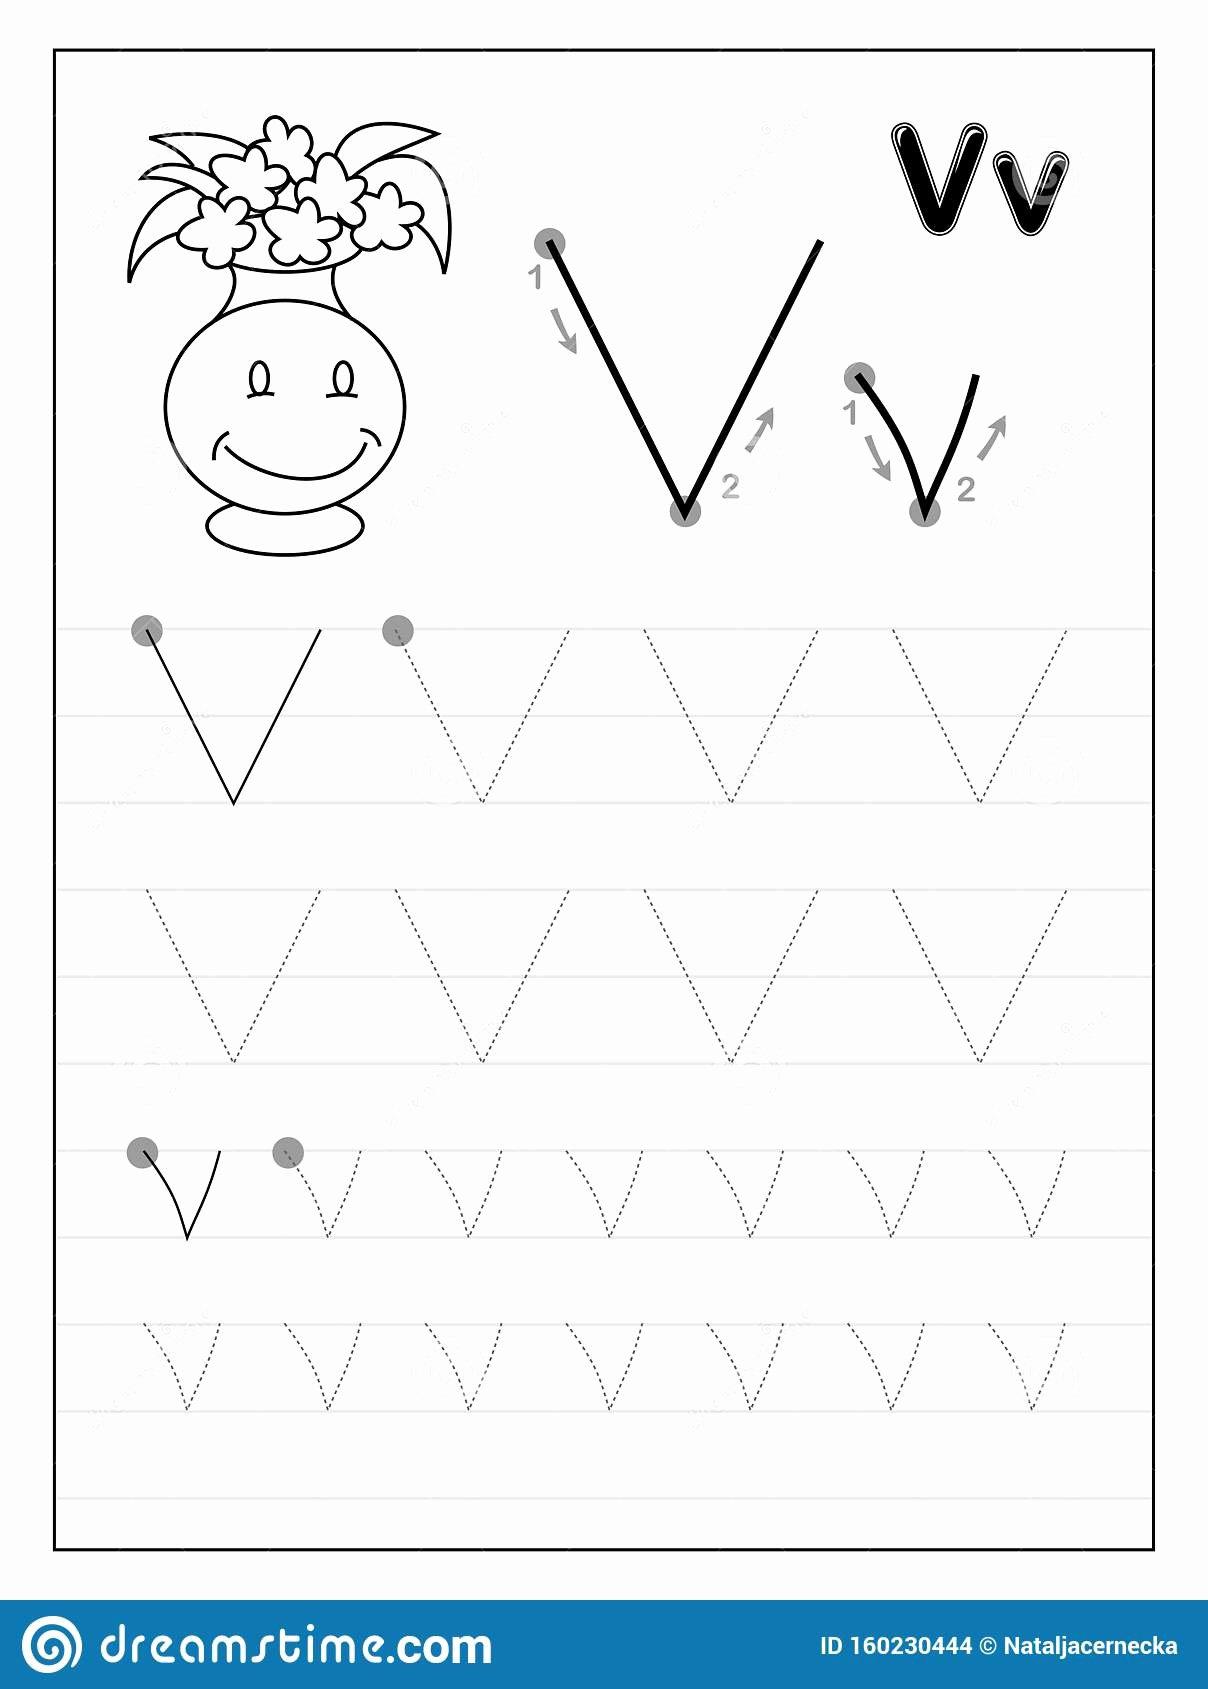 V Worksheets for Preschoolers New Tracing Alphabet Letter V Black and White Educational Pages